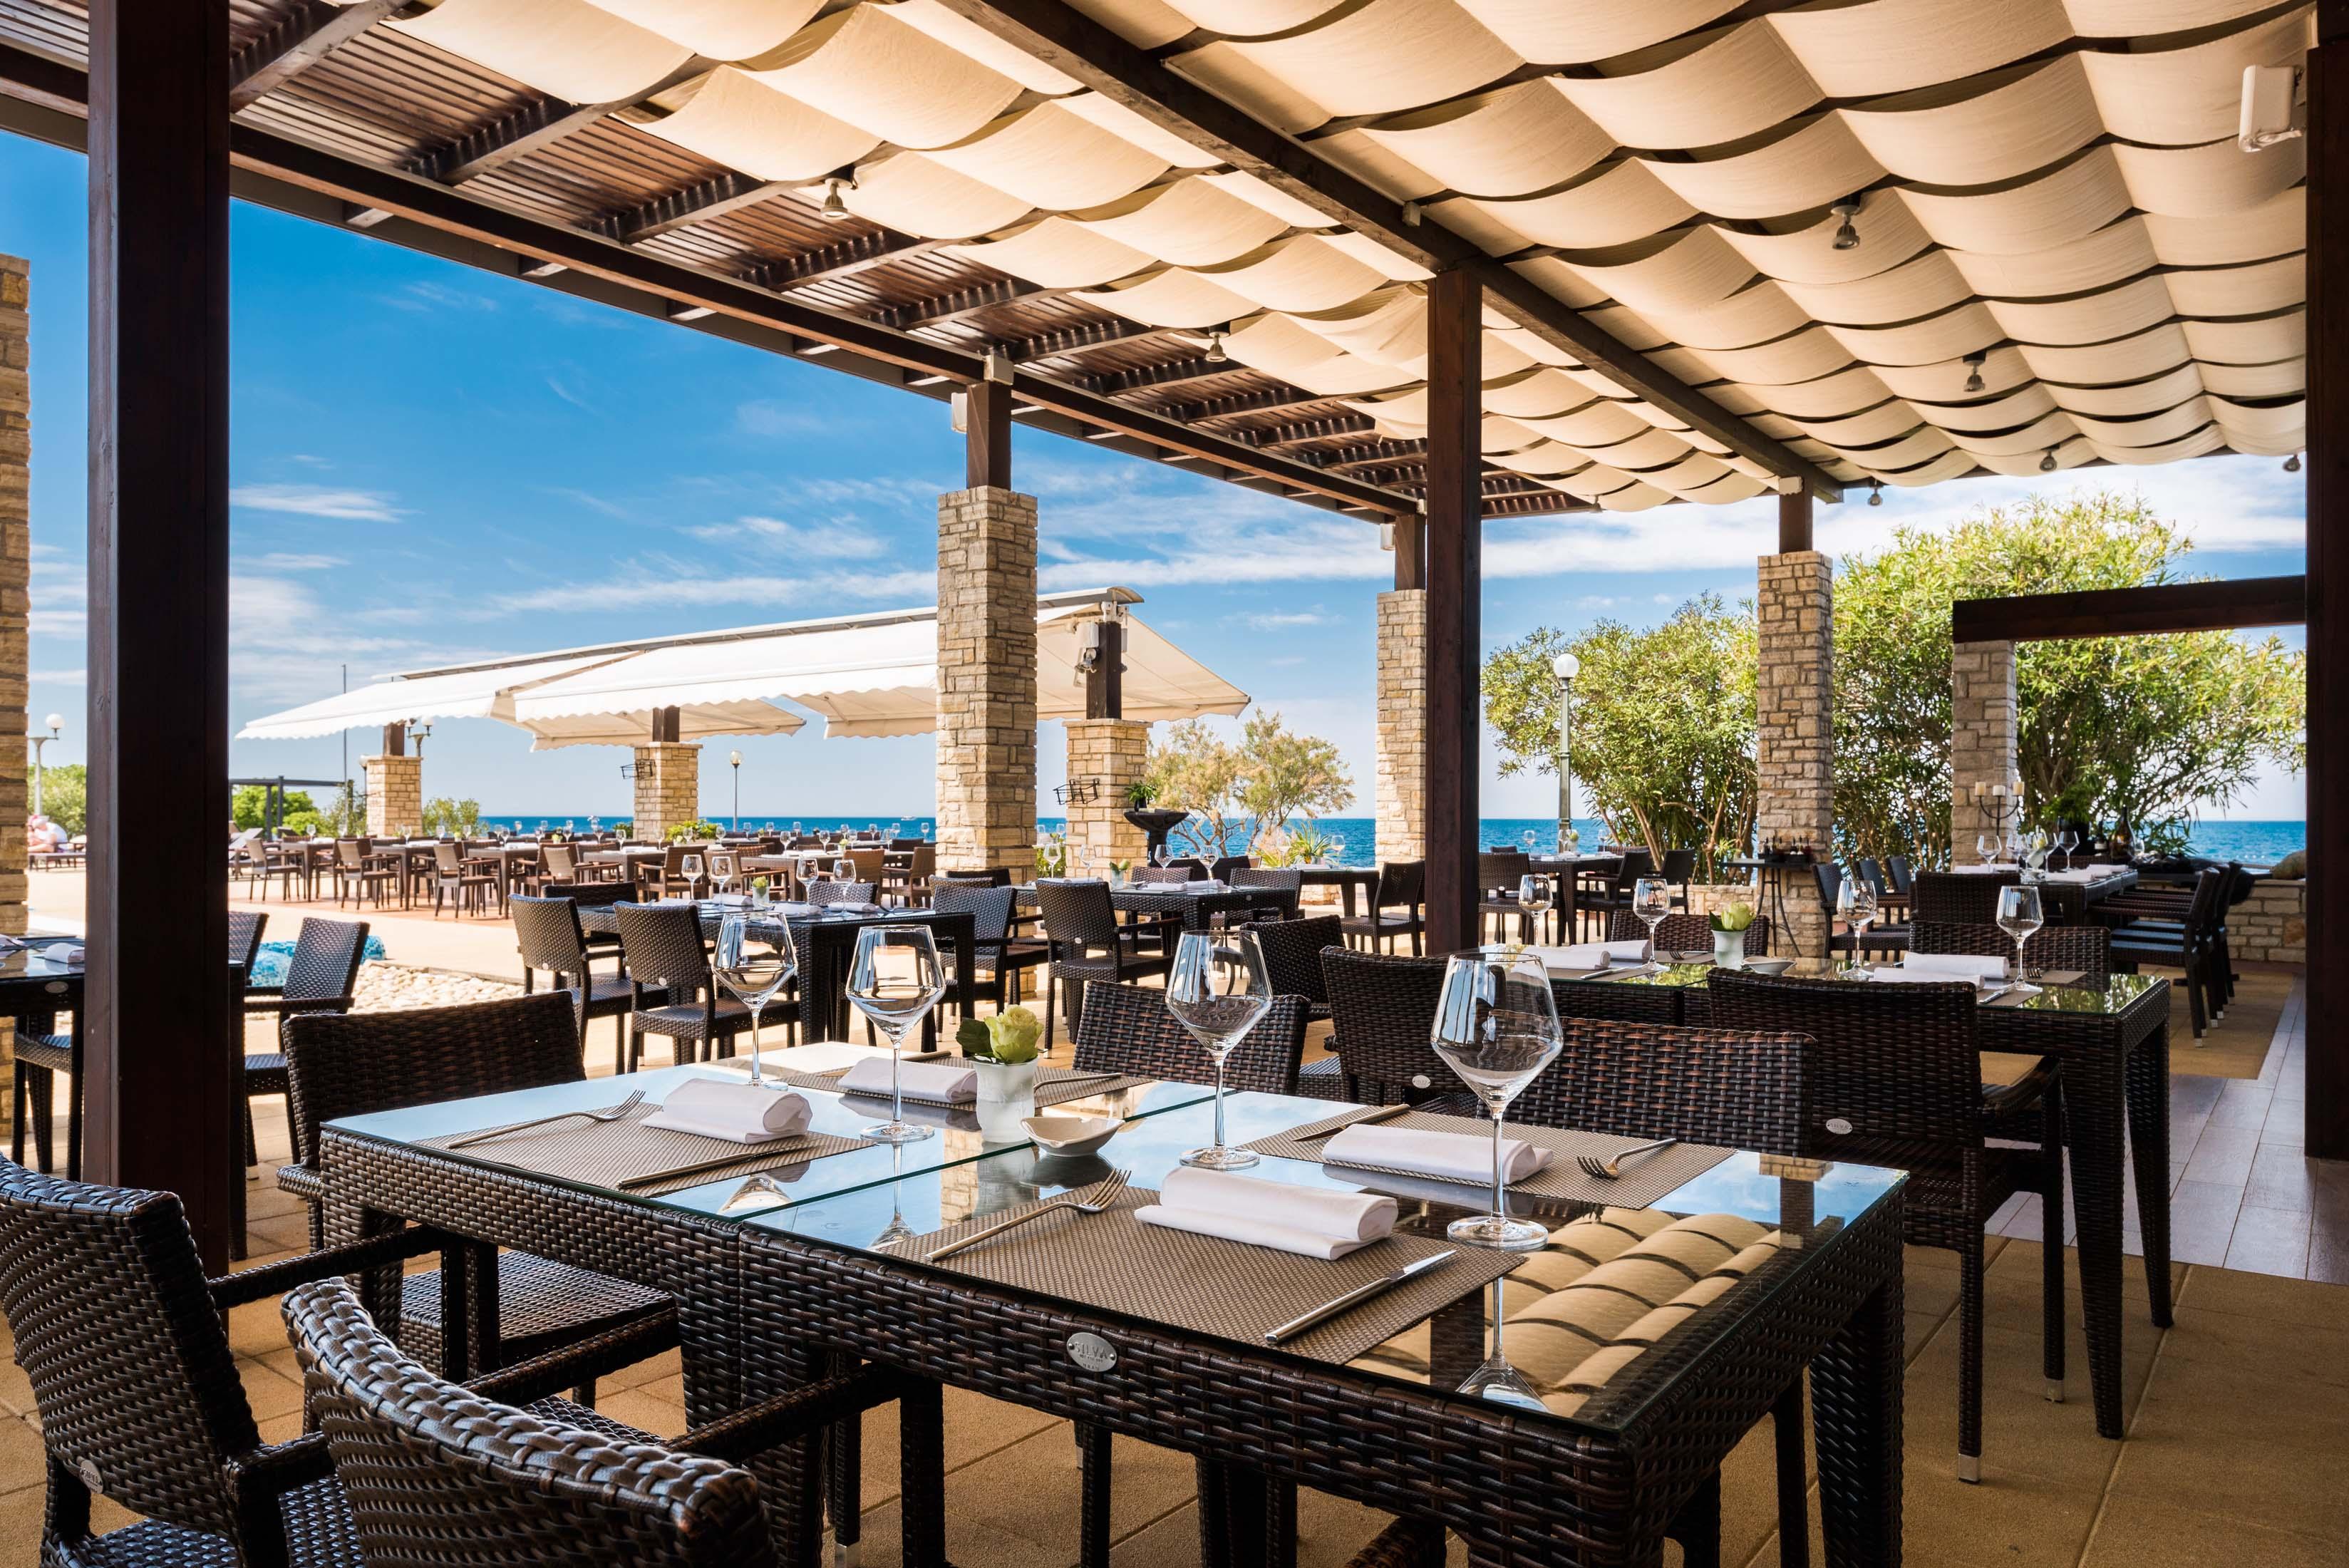 https://cms.satur.sk/data/imgs/tour_image/orig/stella-maris-resort-2016-restaurants-o-grille_-5-1800585.jpg